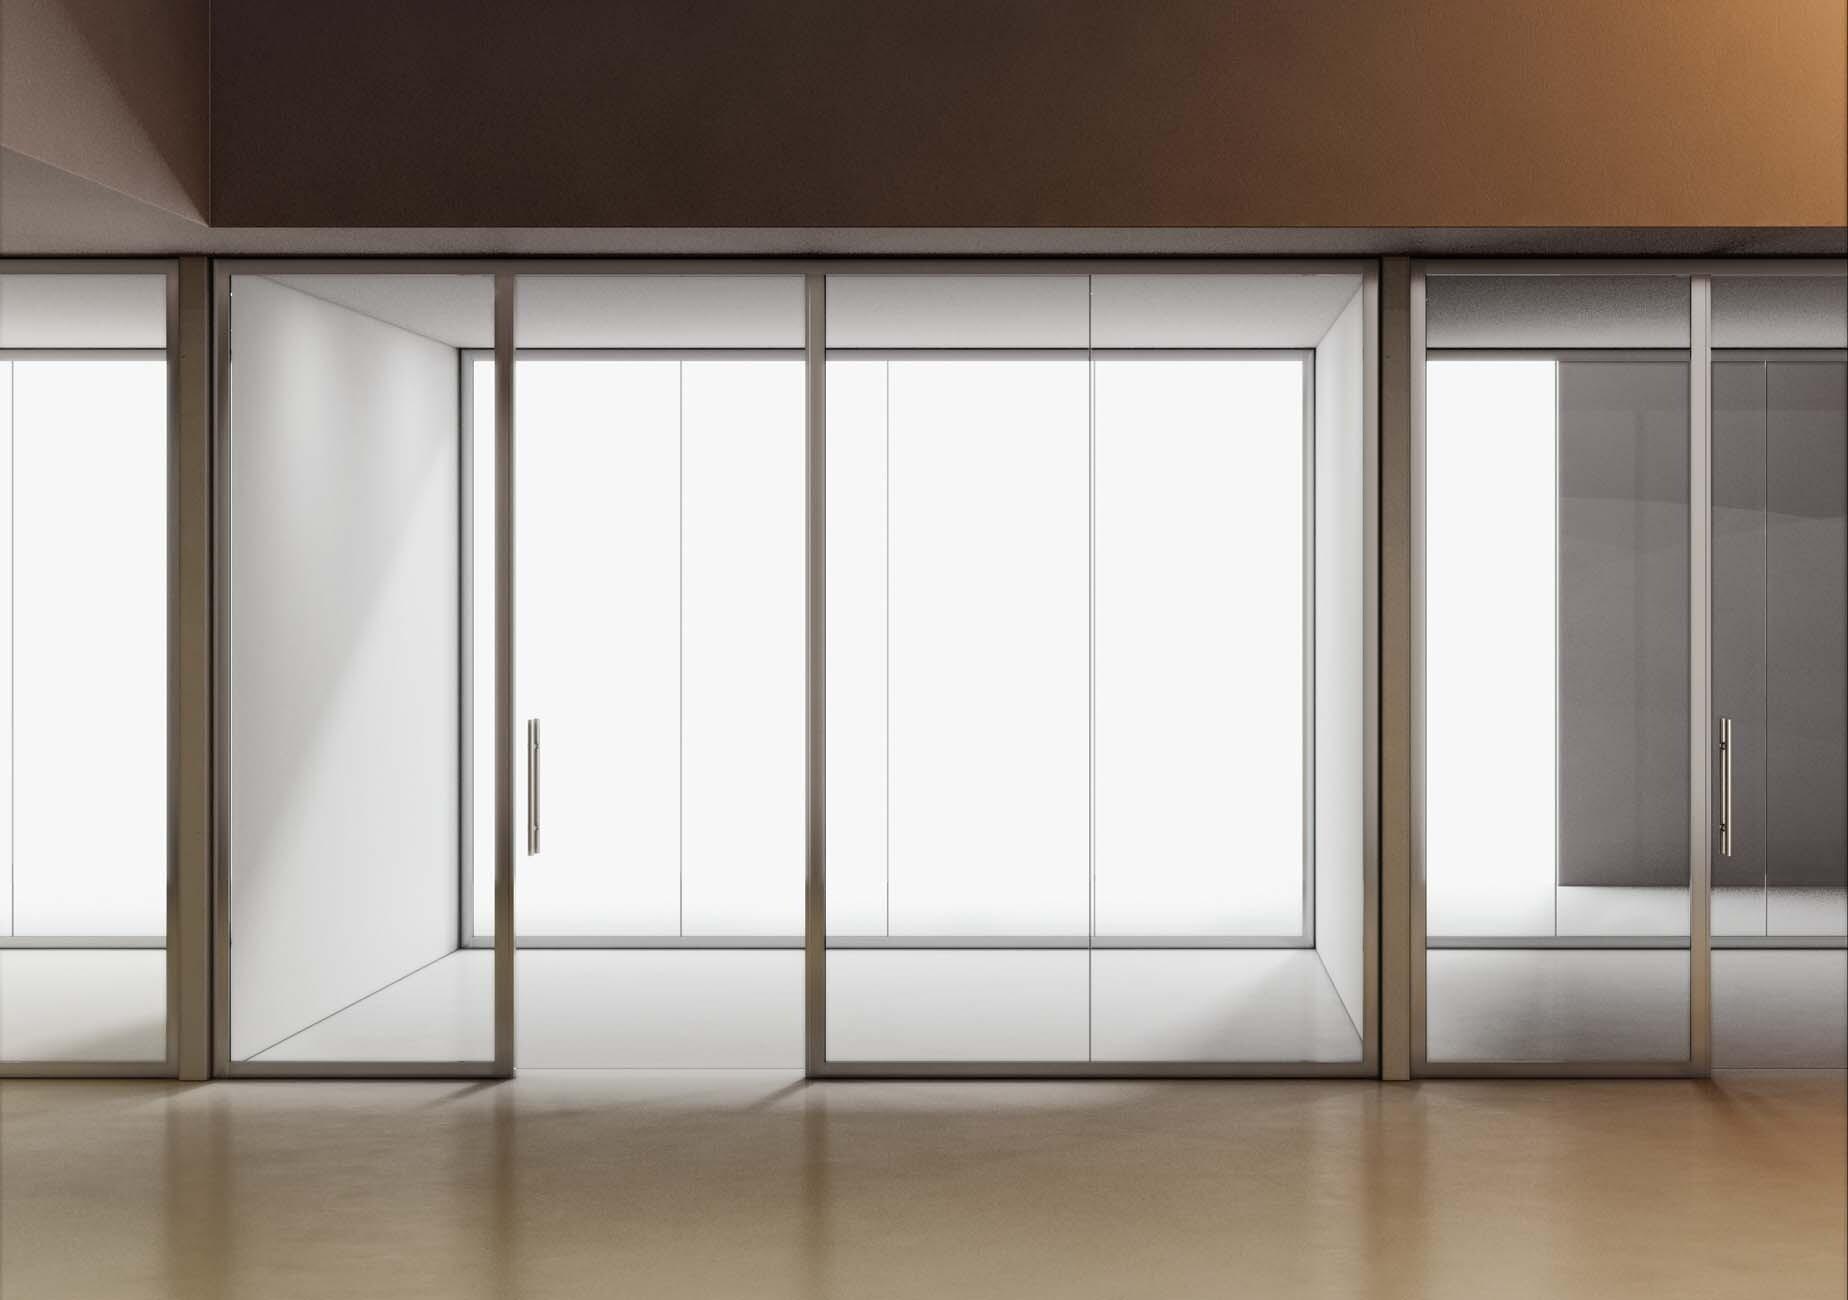 glass-wall-sliding-dwel-16-2.jpg